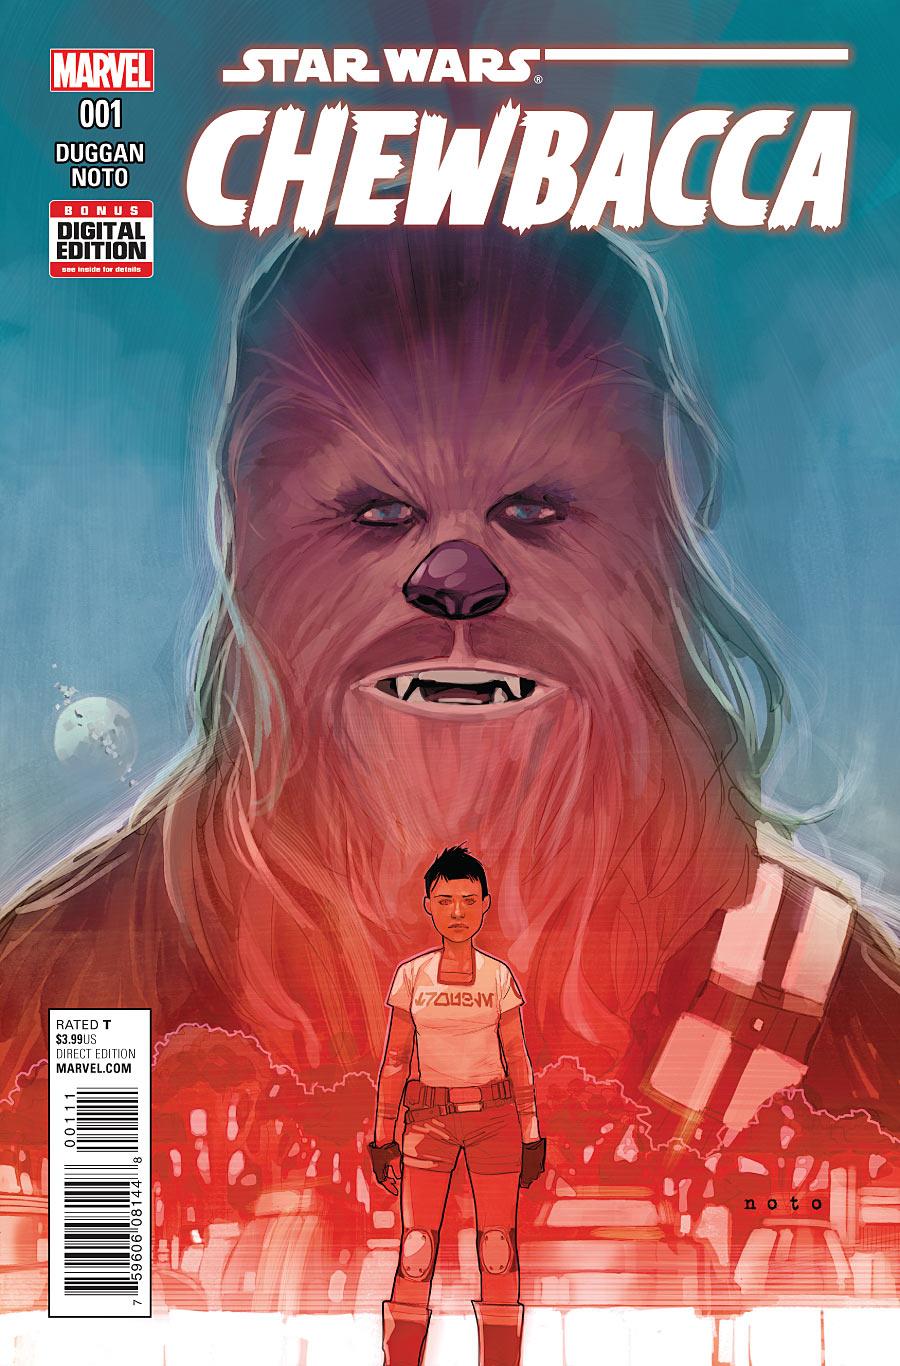 Star Wars: Chewbacca #1